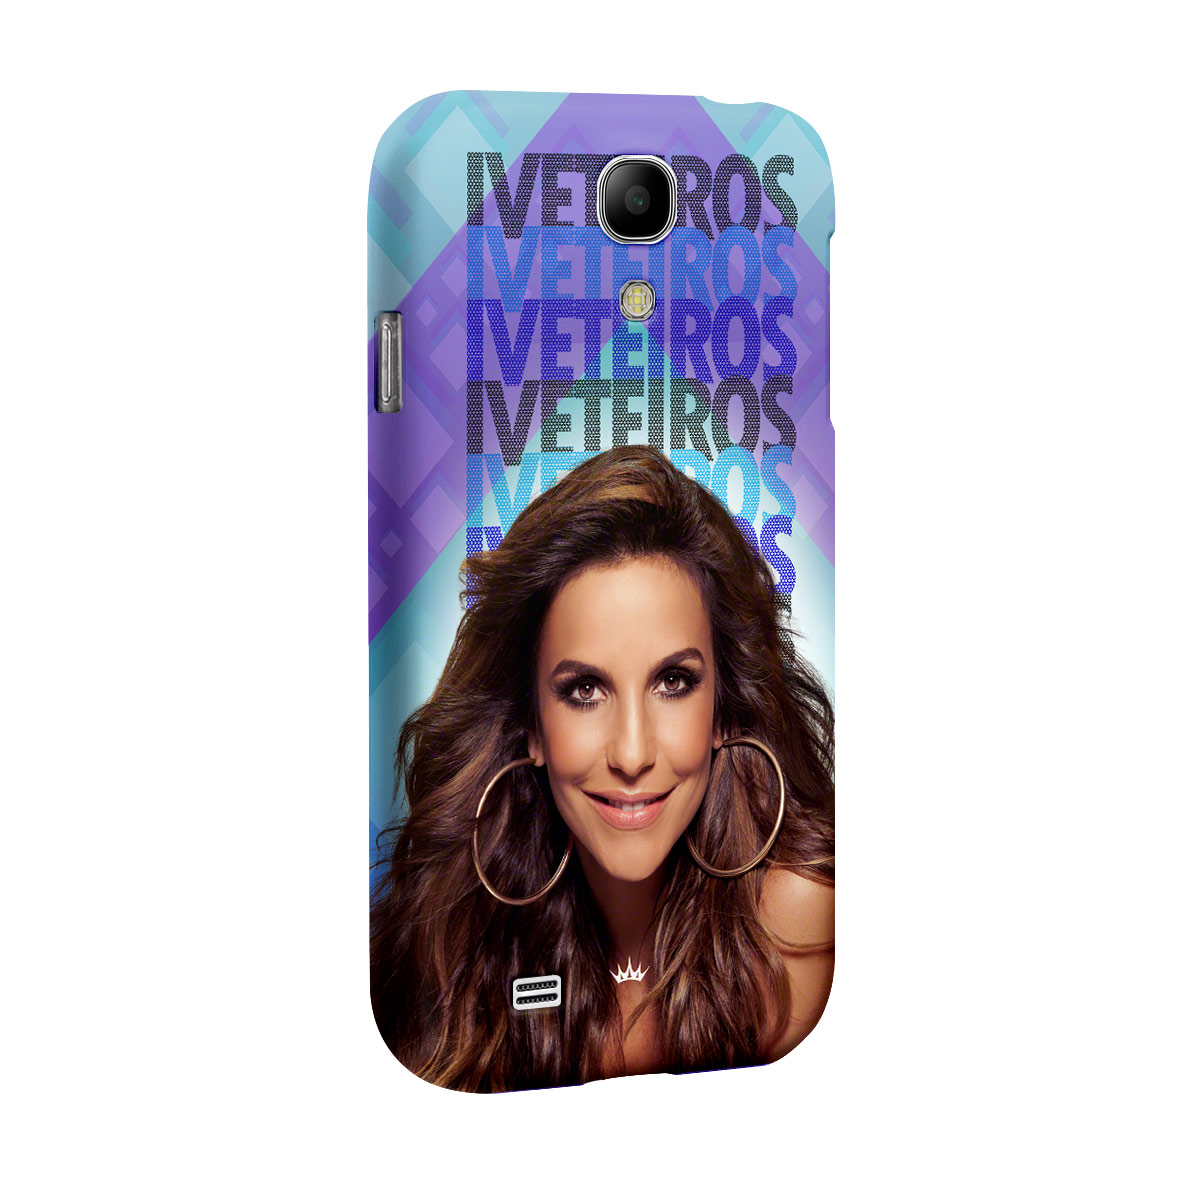 Capa para Samsung Galaxy S4 Ivete Sangalo Iveteiros